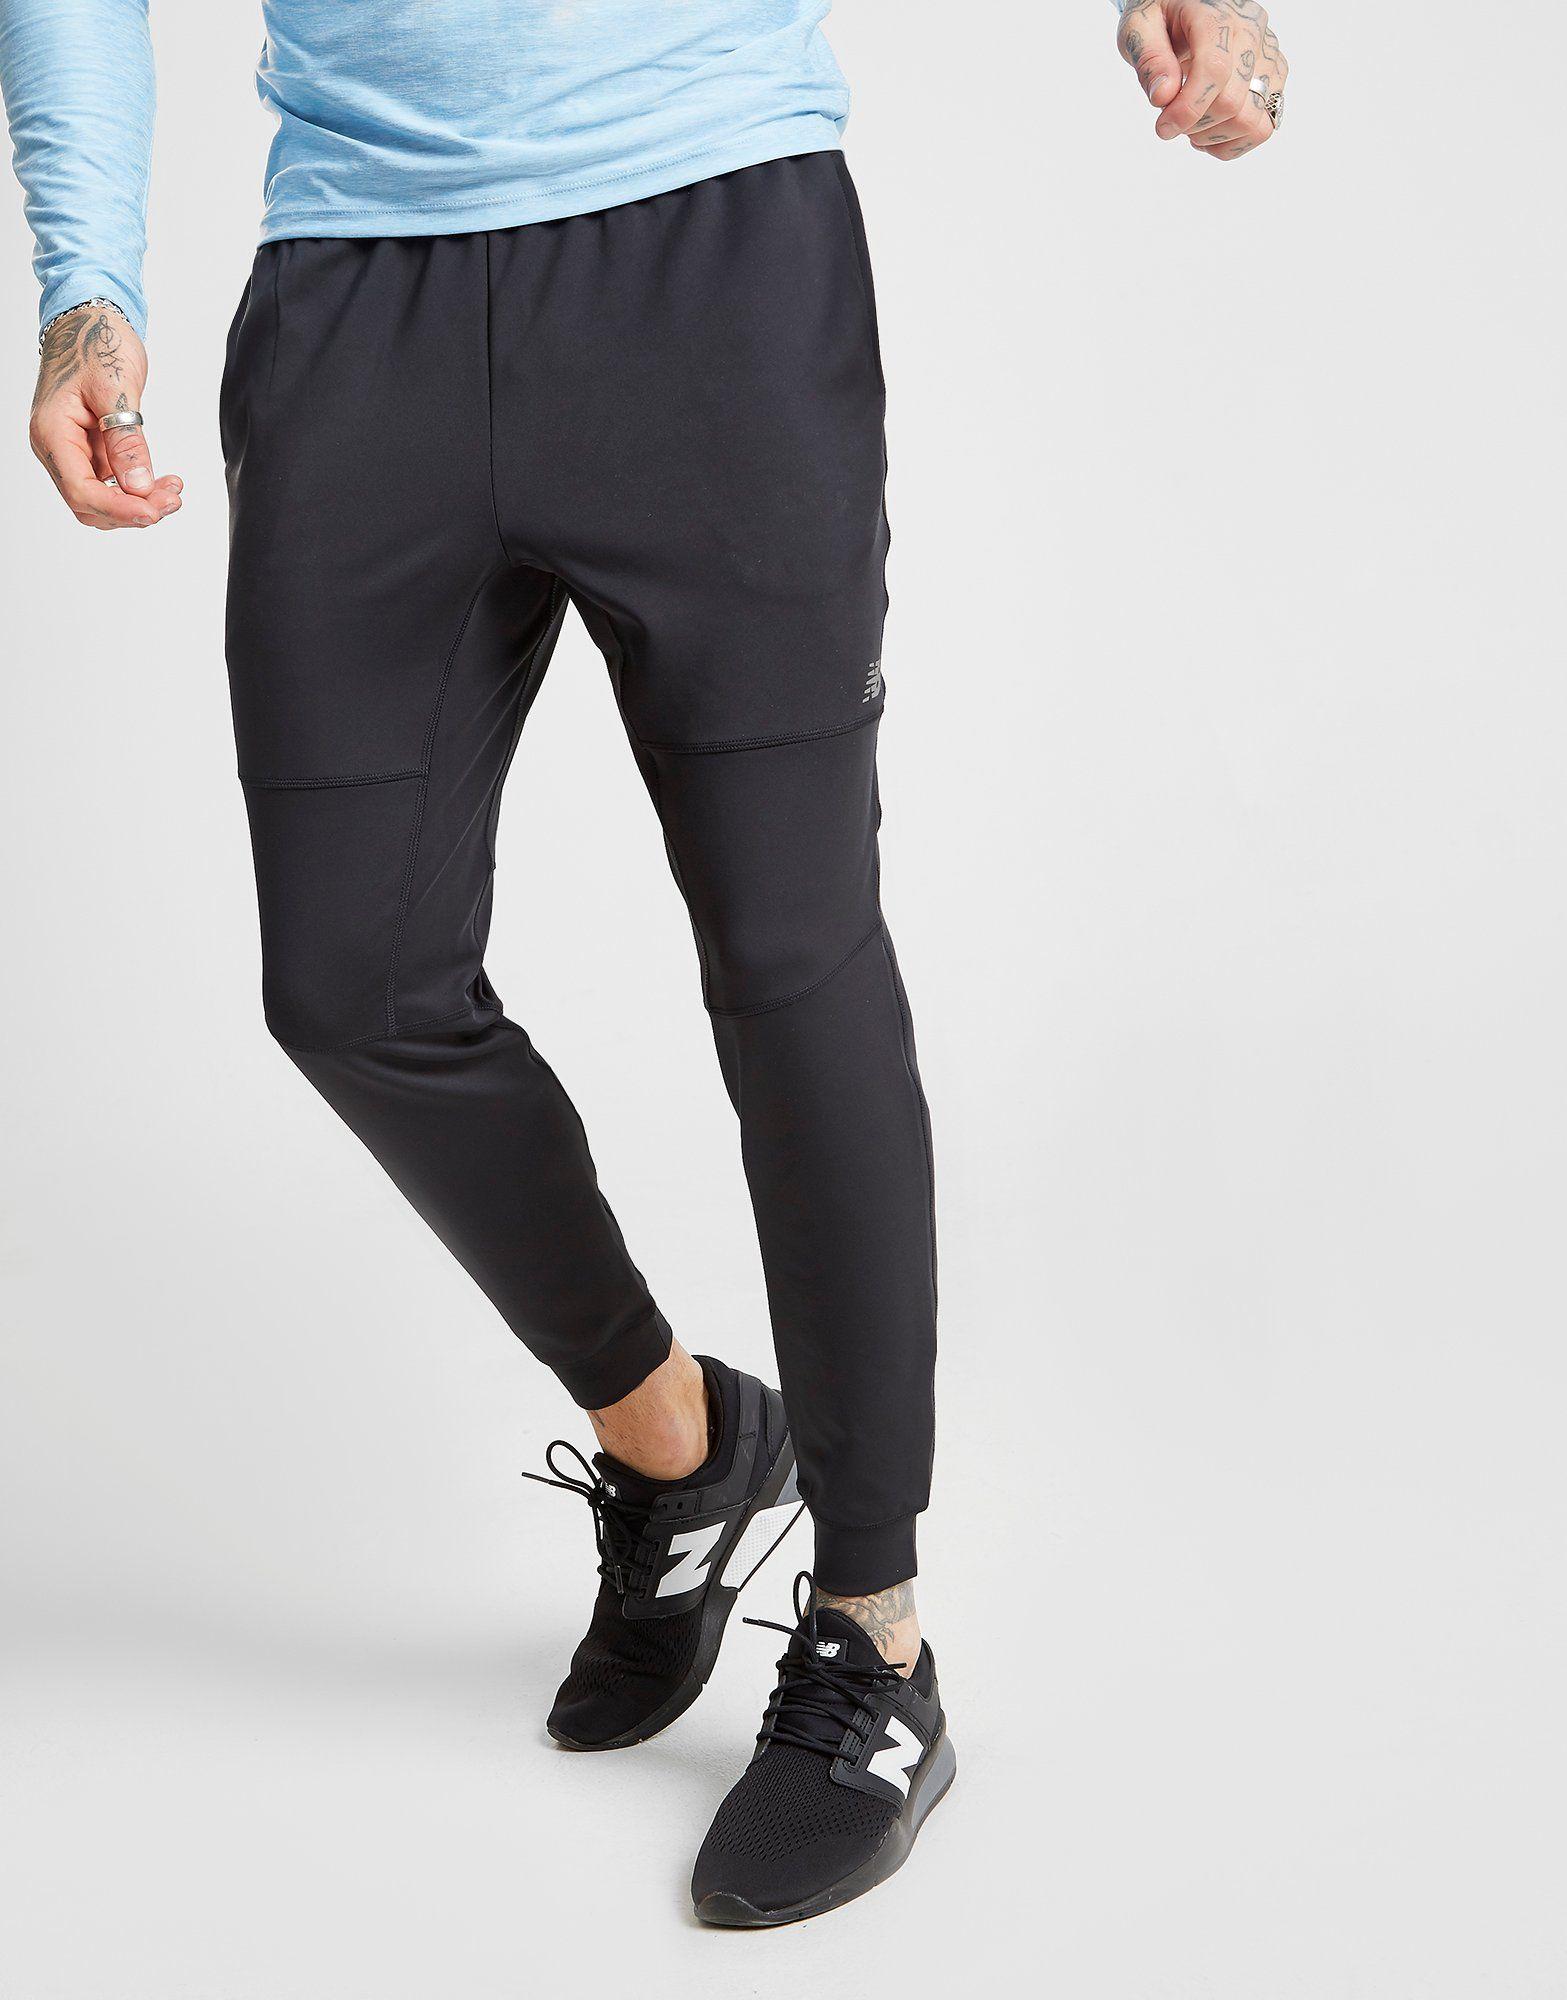 New Balance Poly Track Pants